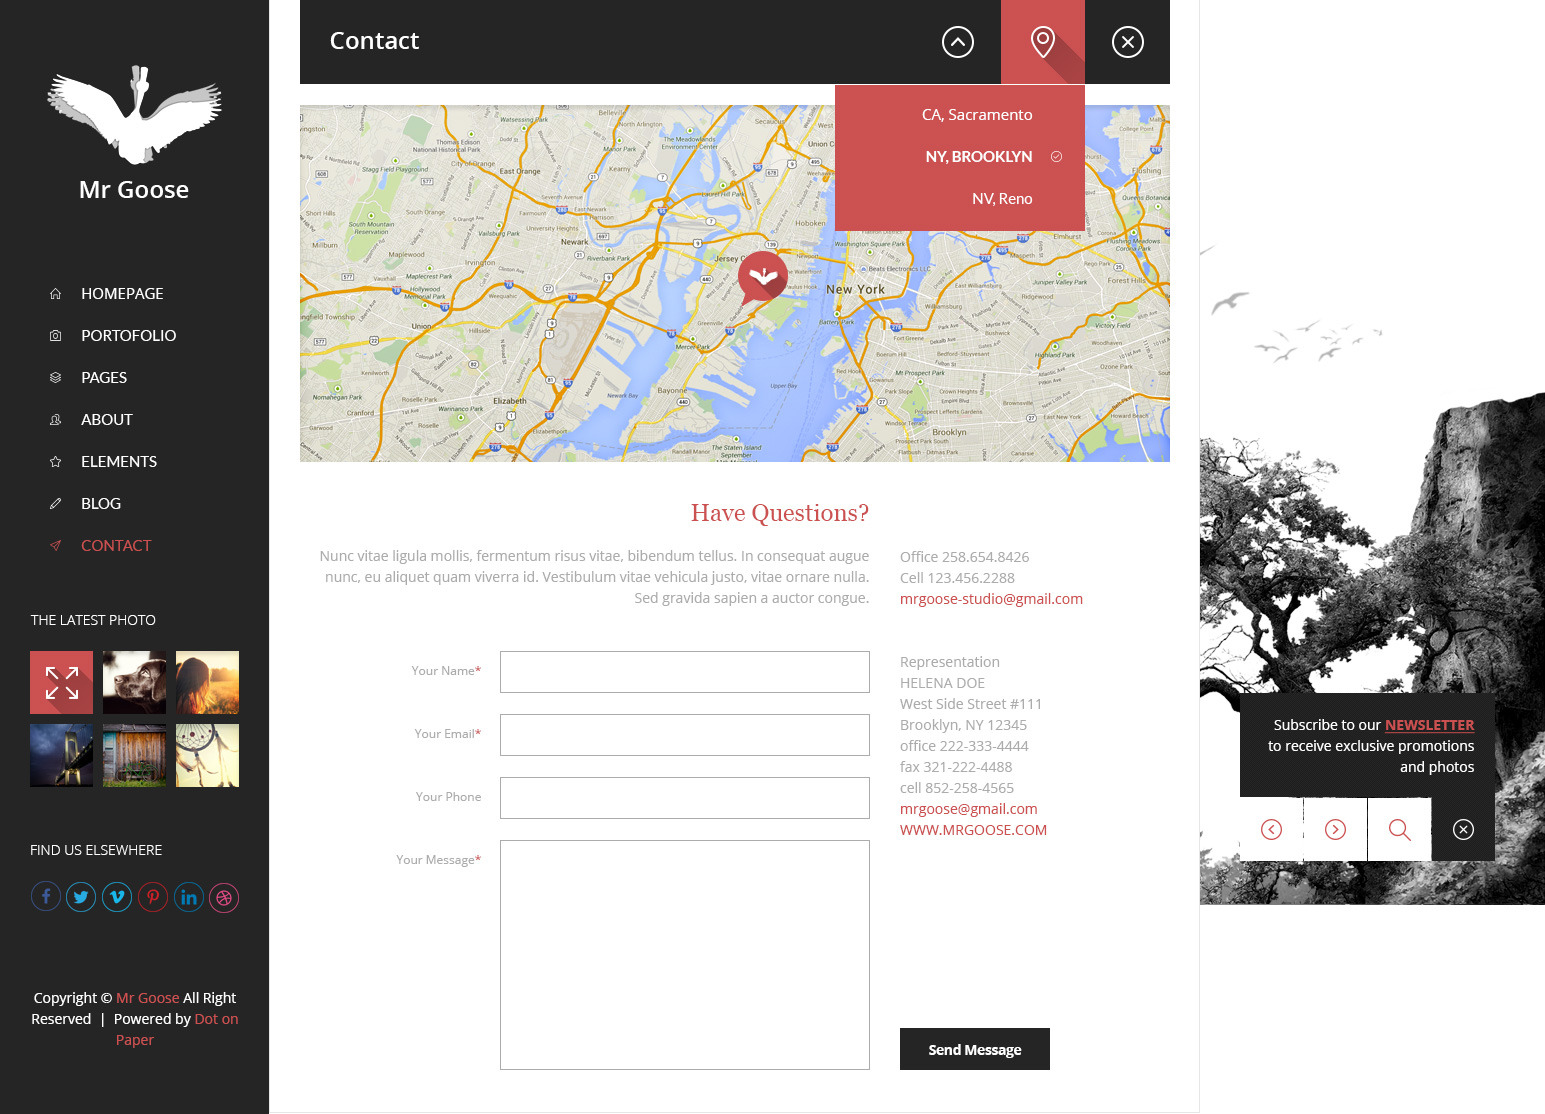 Mr Goose - Creative PSD Template - Desktop - Contact